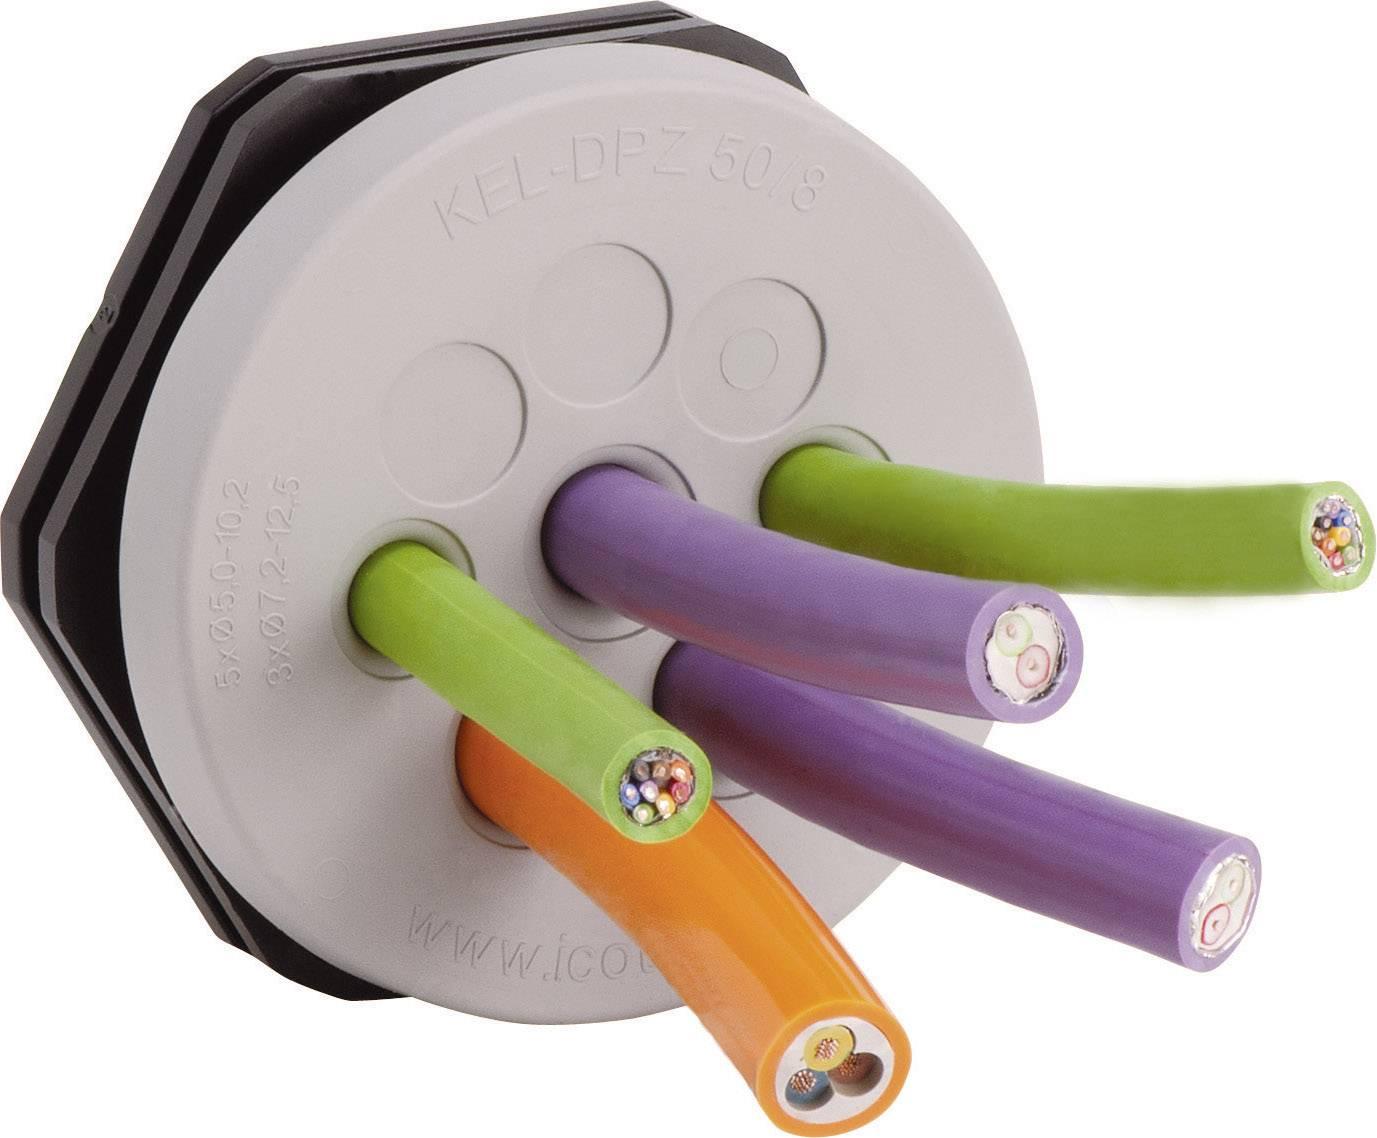 Icotek Uvodnica za kable KEL-DPZ okrogla KEL-DPZ 63|13 velikost: M63 poliamid/elastomer, siva